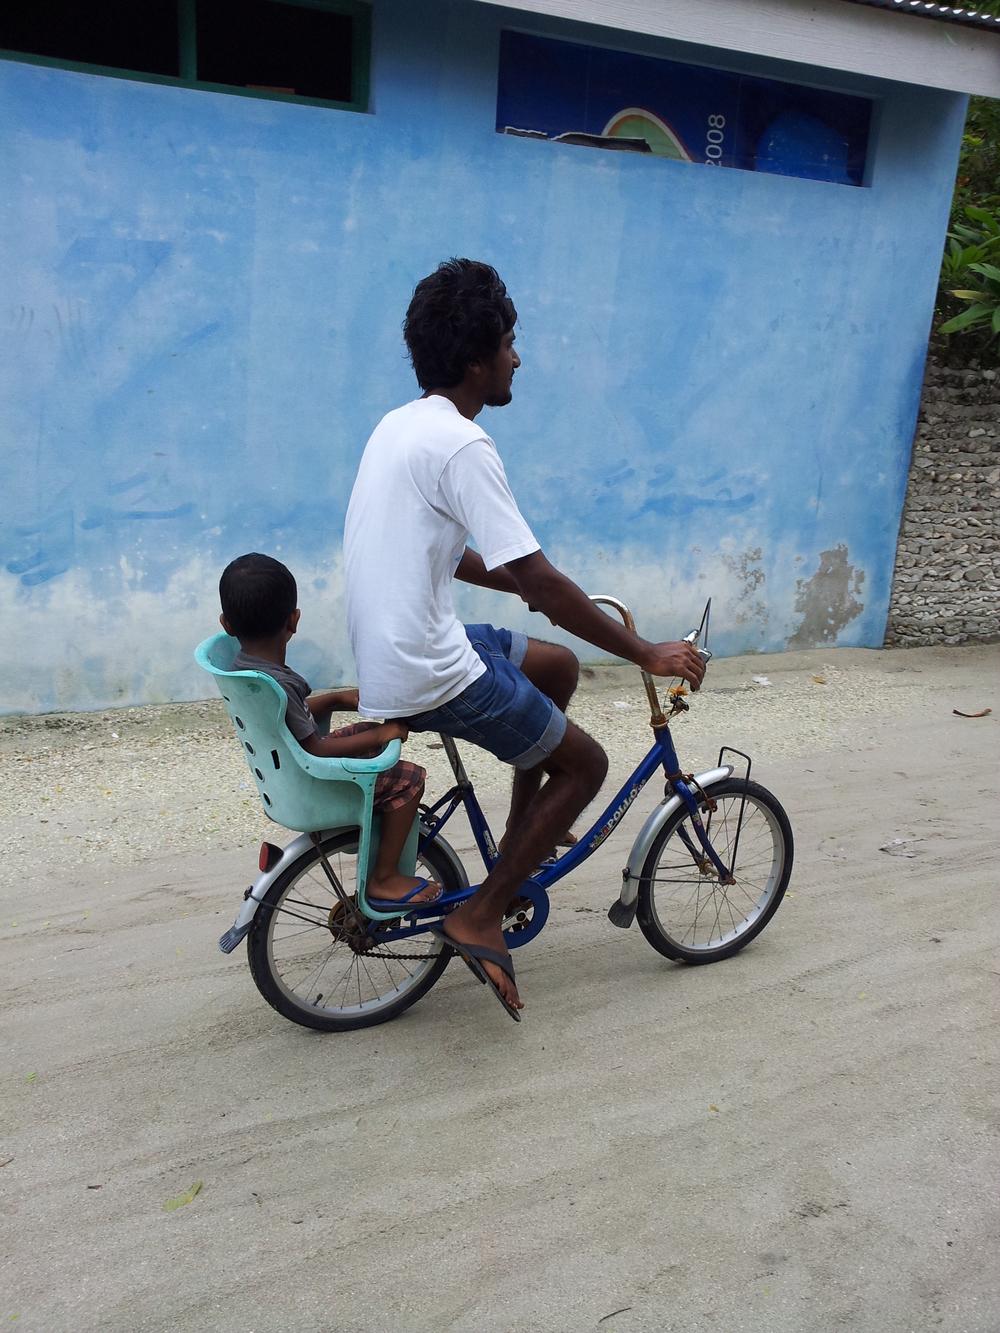 kanditheem cyclist.jpg